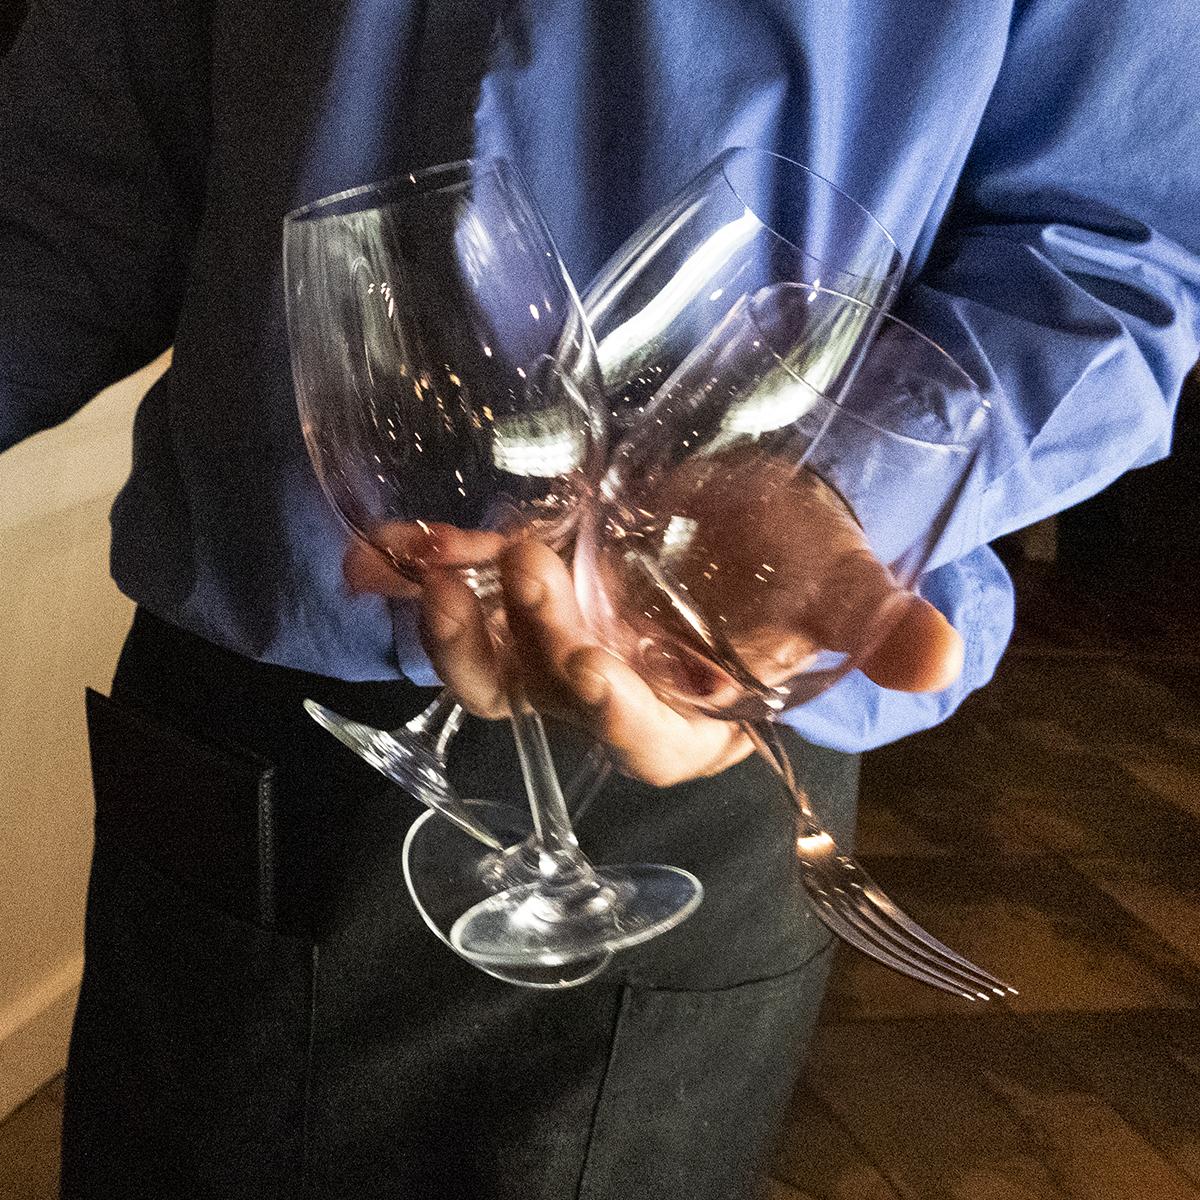 BrasserieProvenceWineGlasses.jpg